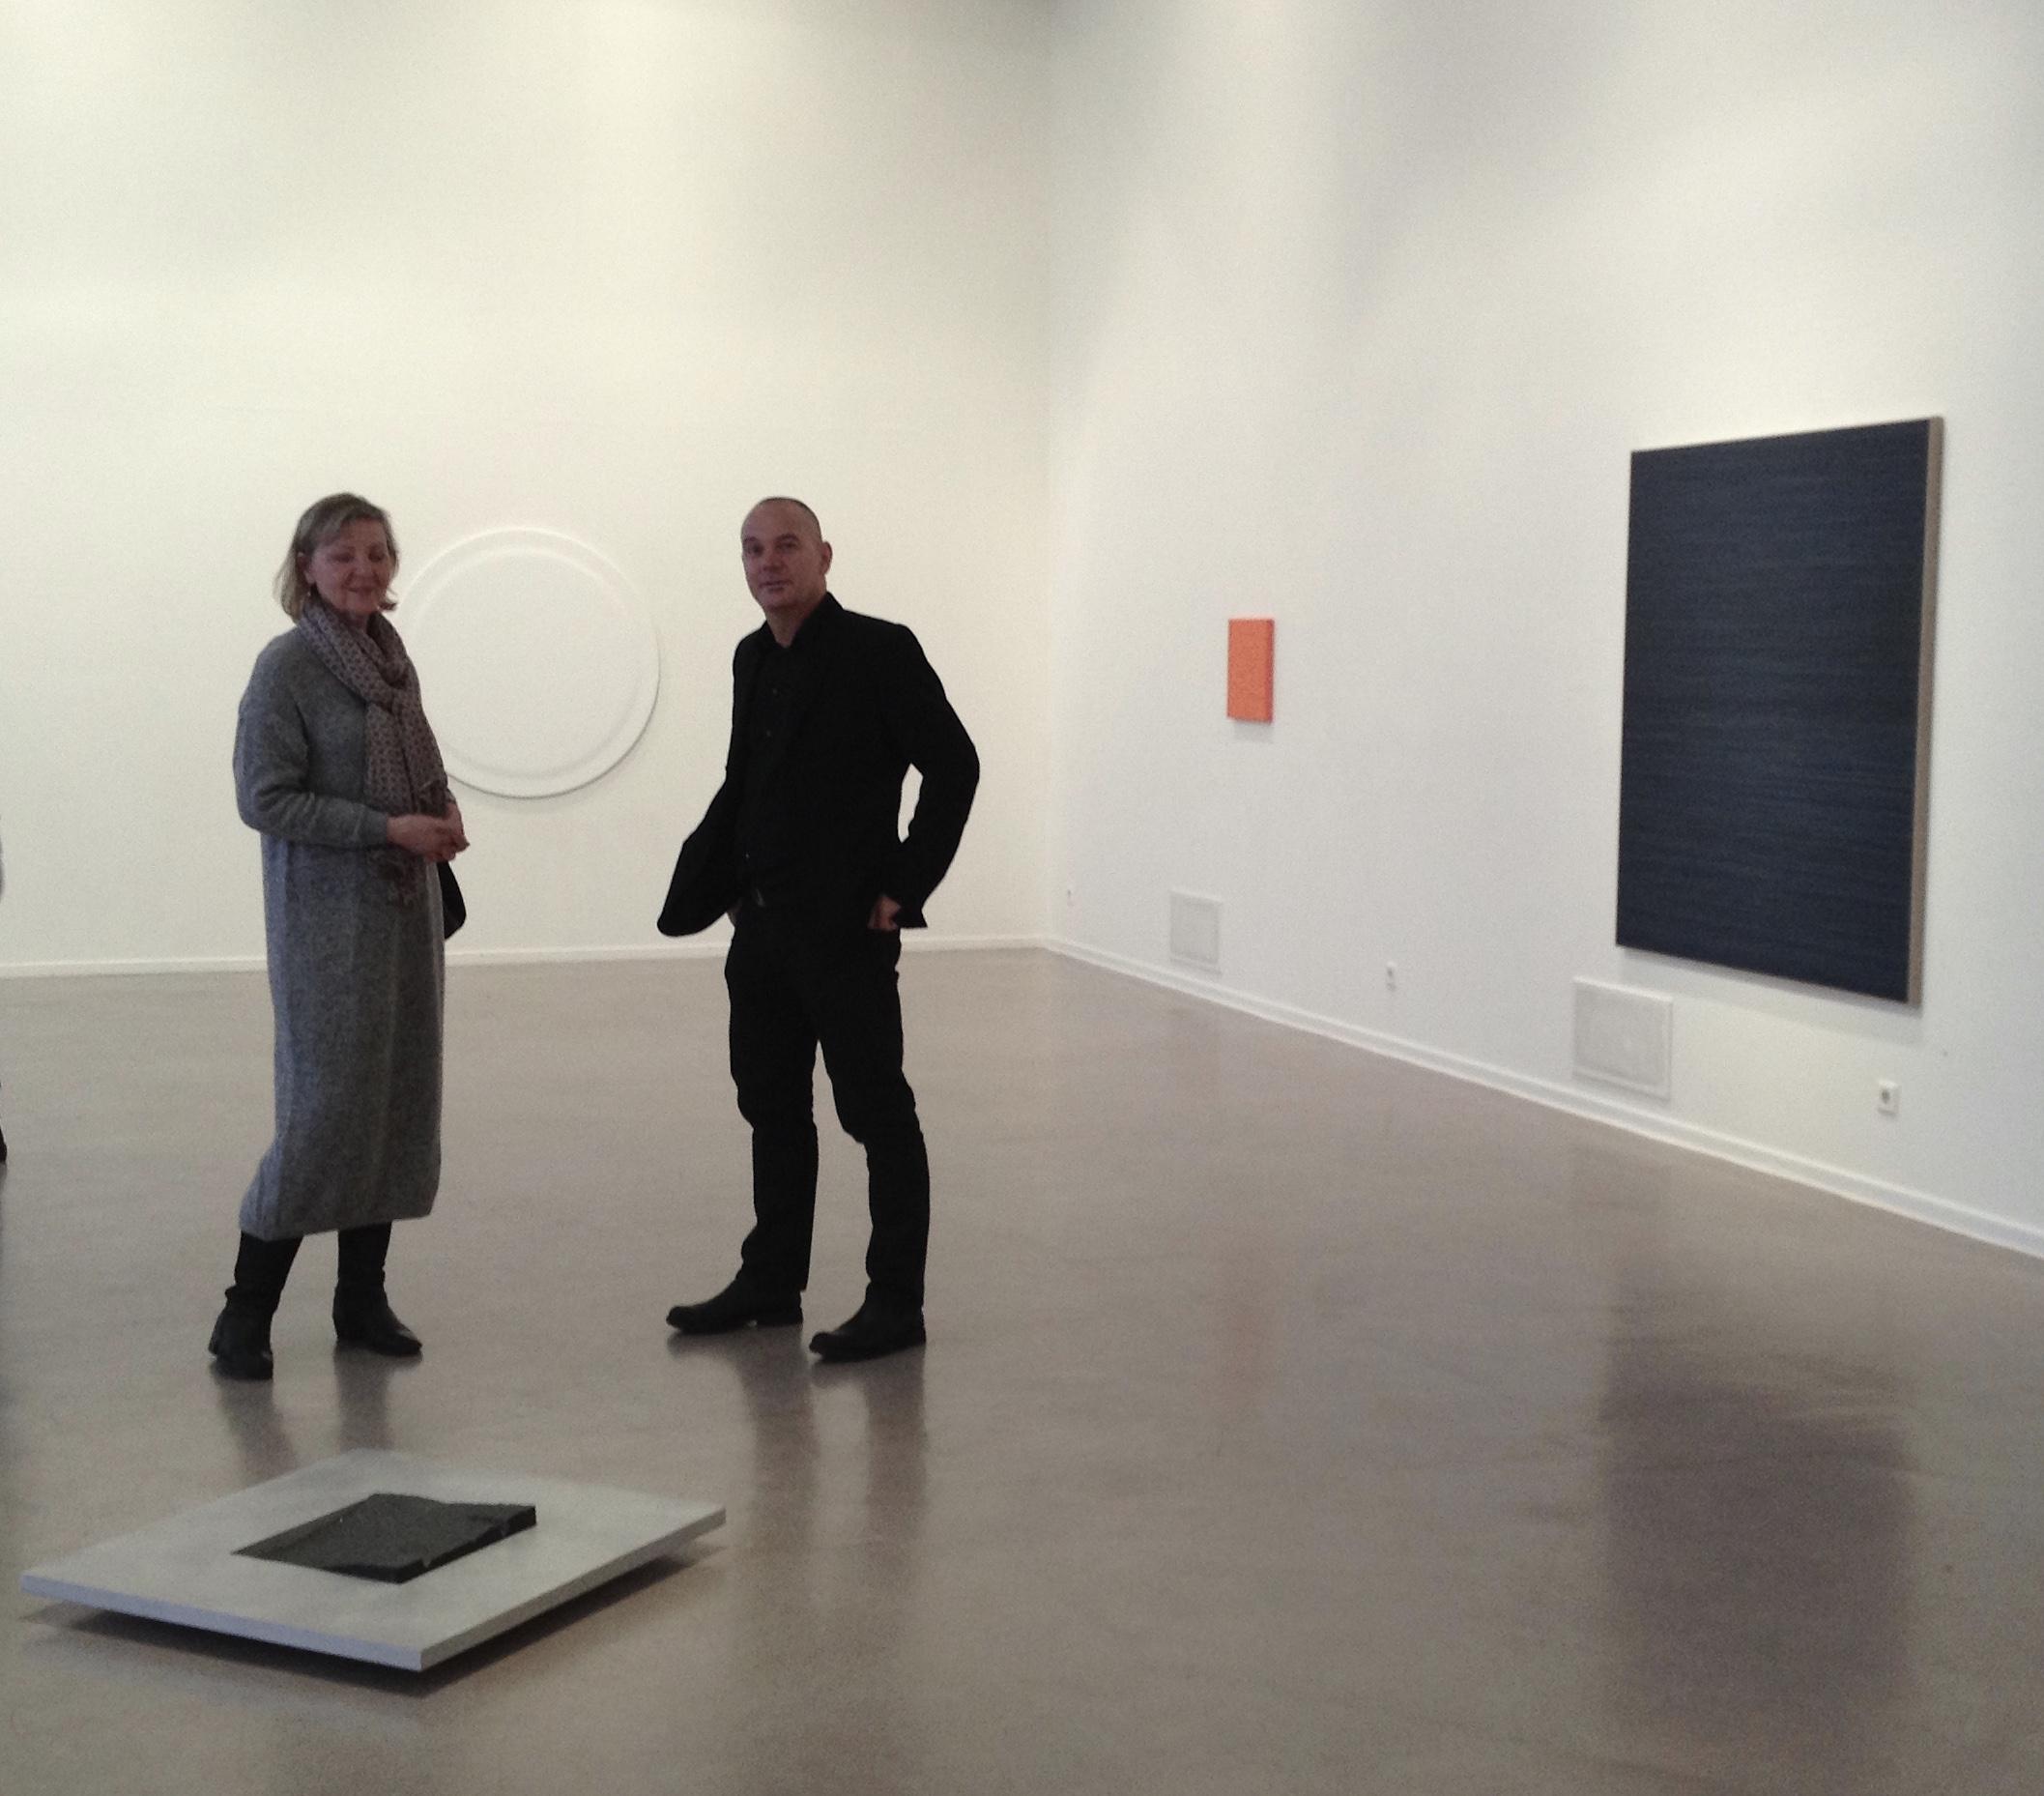 Kerstin Hedman, Lars Standh behind Terje Roalkvams object.